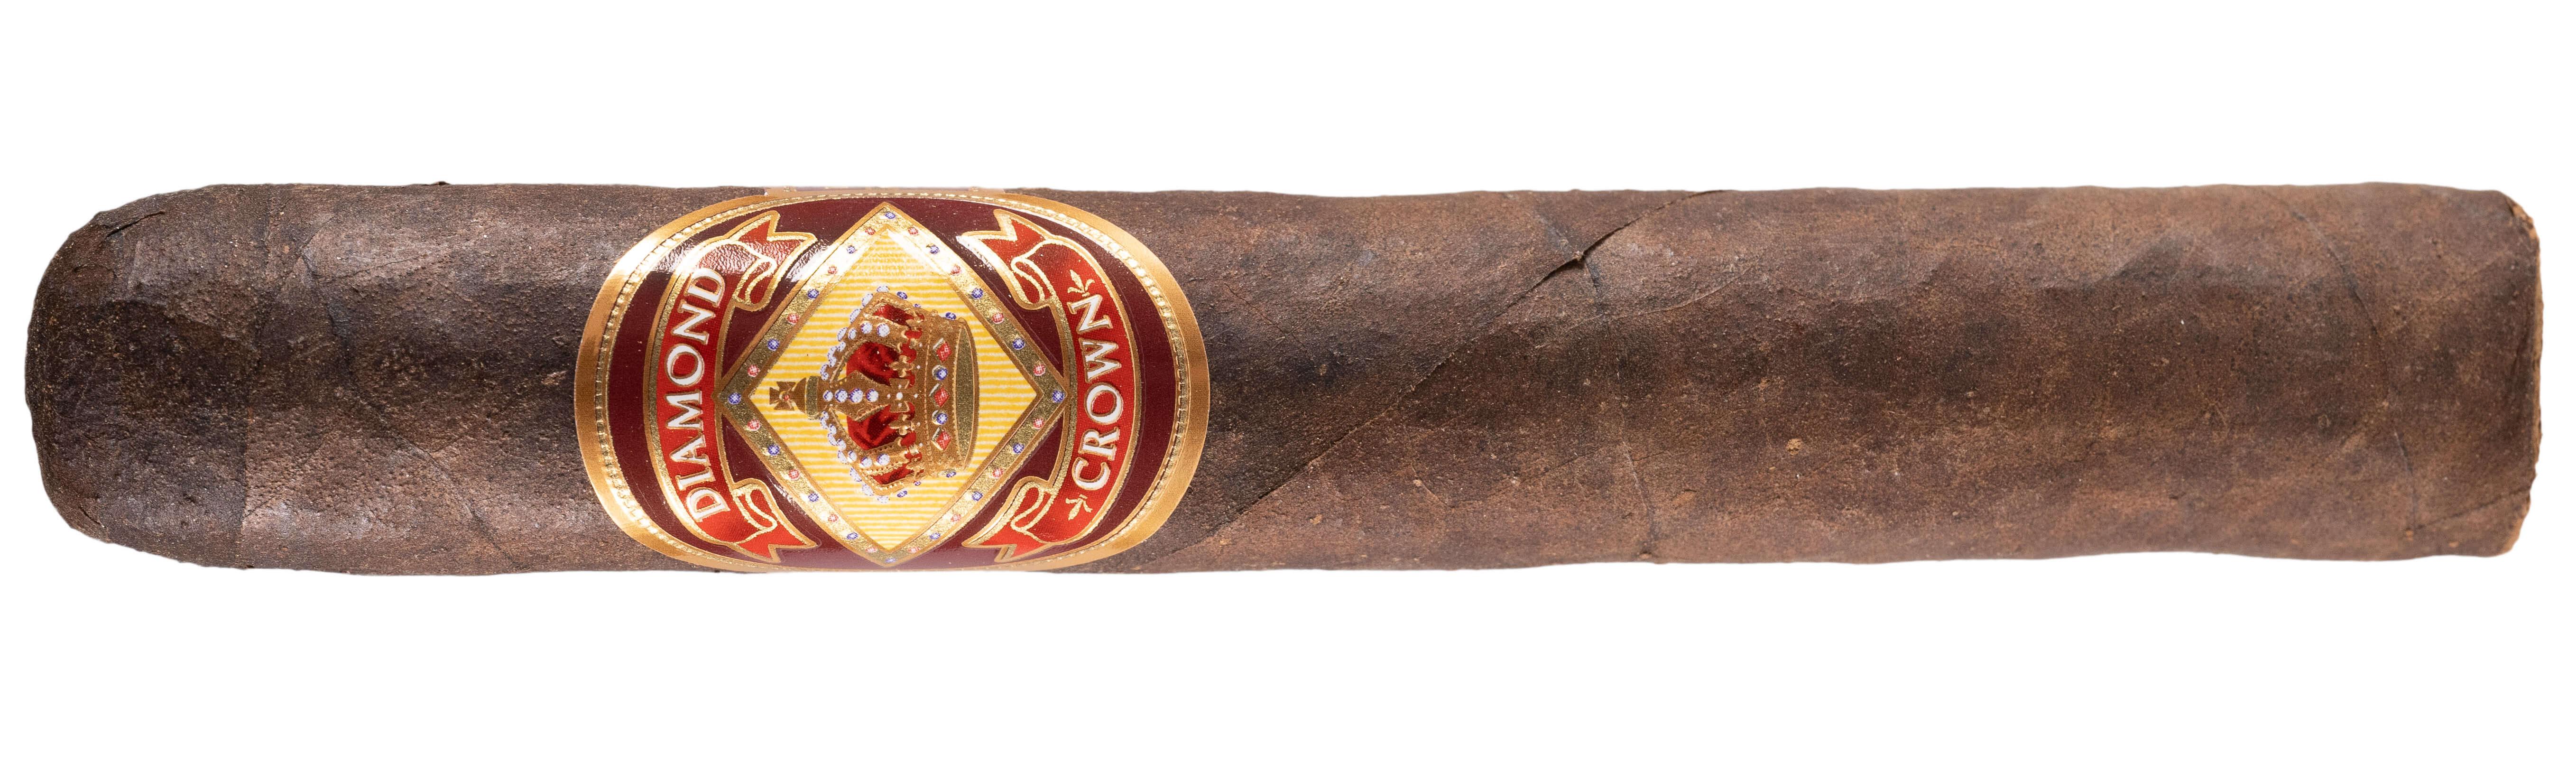 Blind Cigar Review: J.C. Newman | Diamond Crown Maduro No. 4